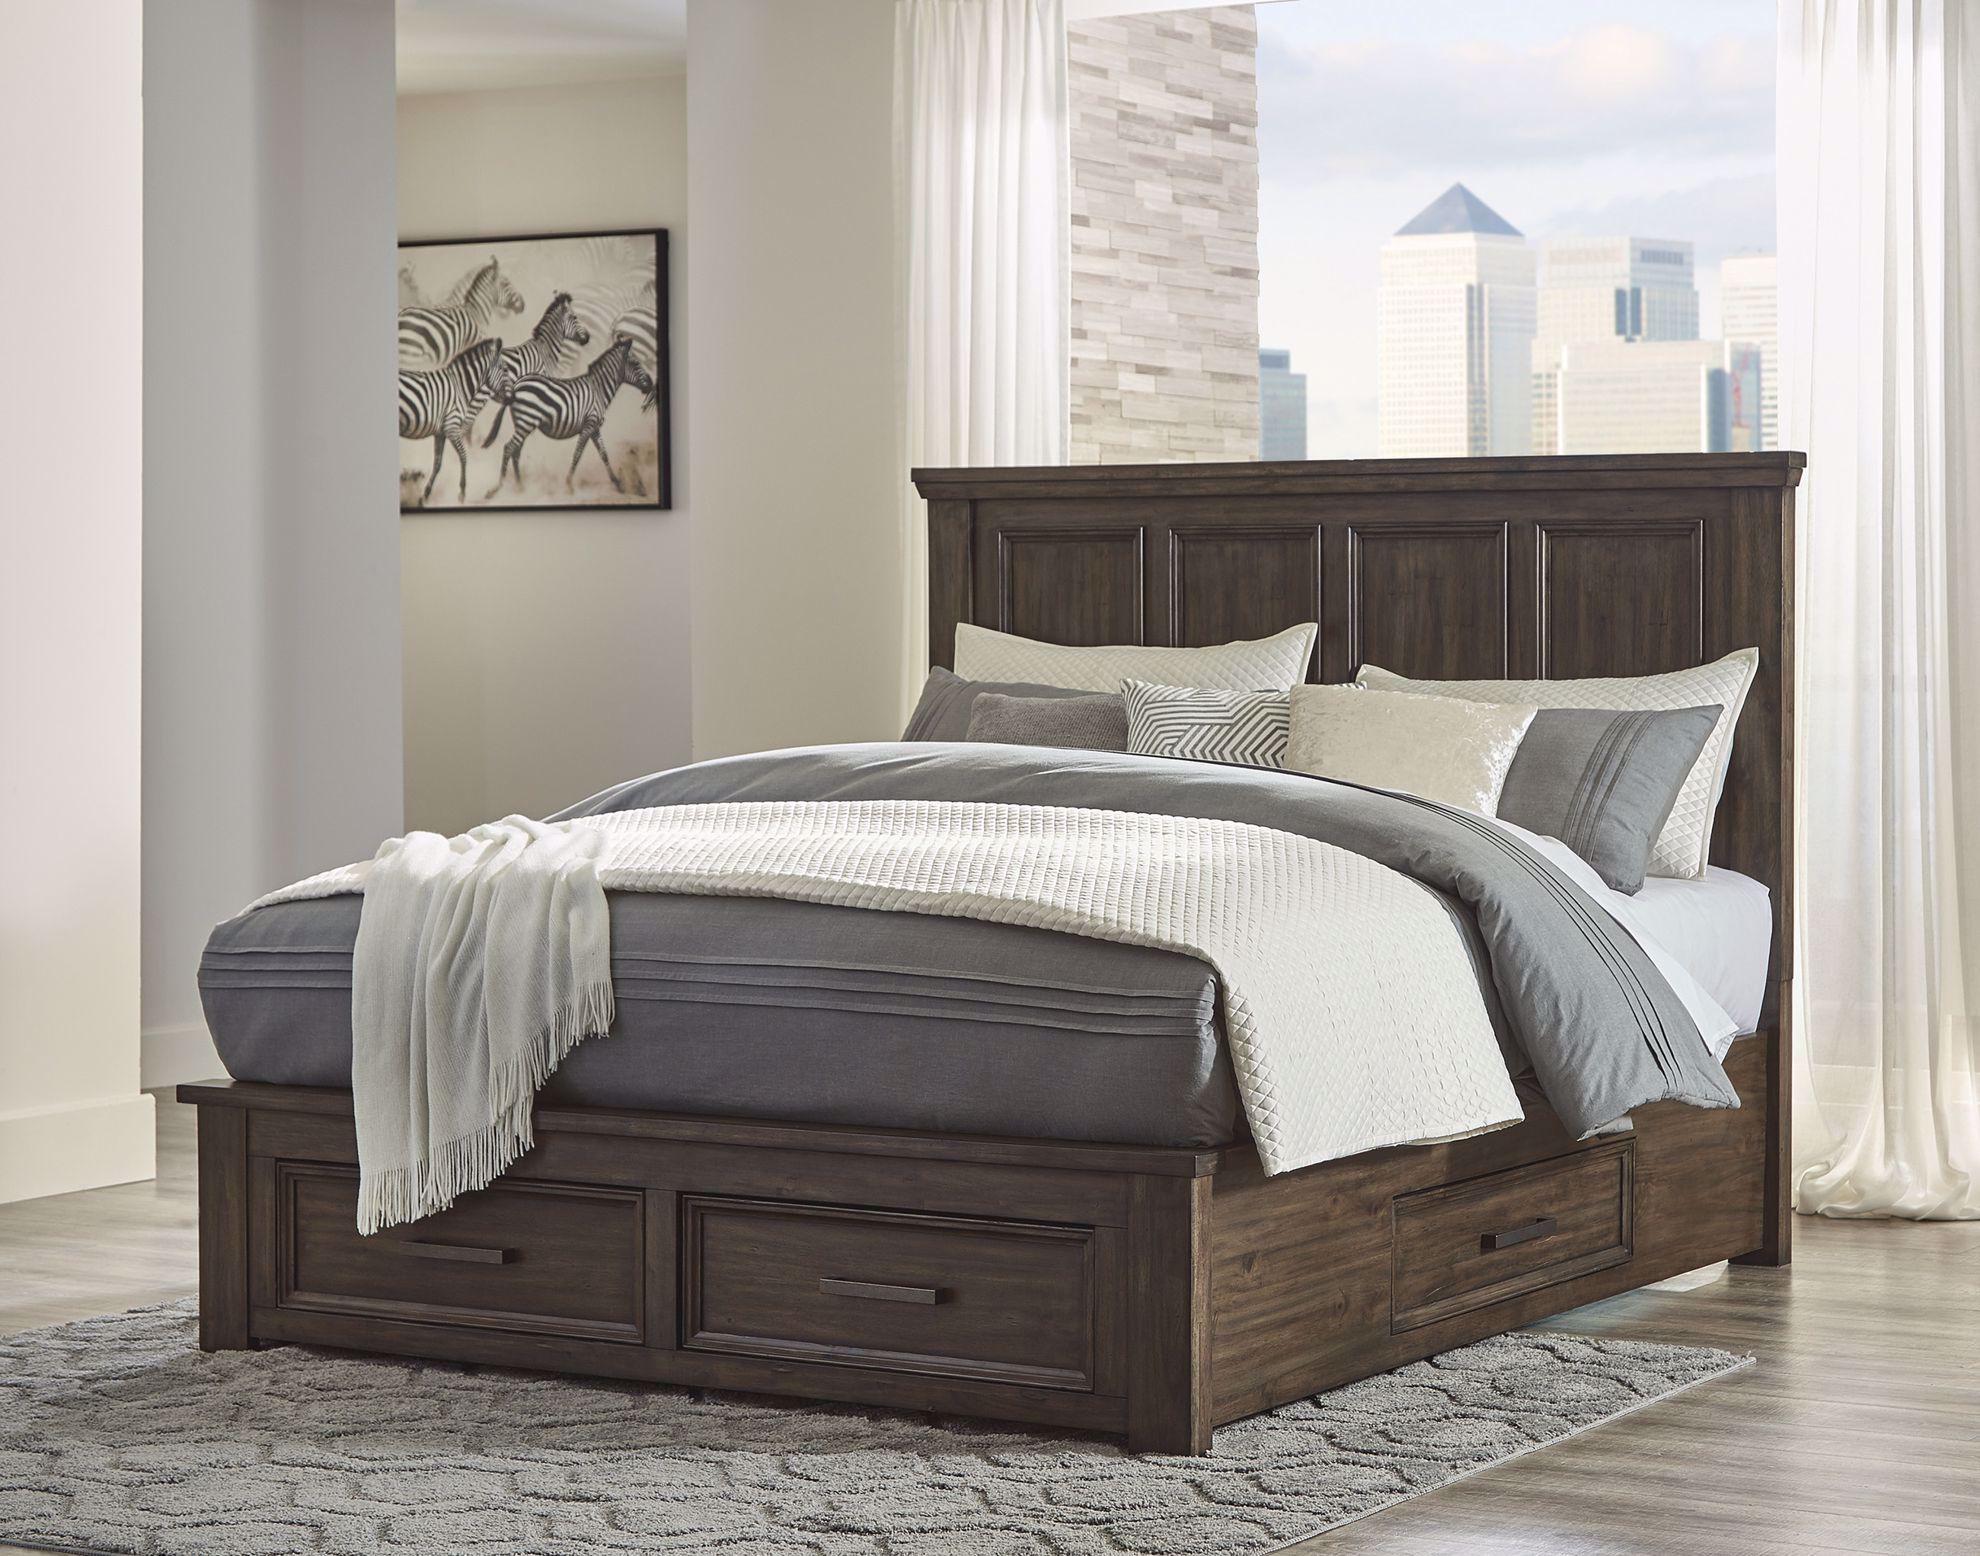 Picture of Johurst Storage Queen Bed